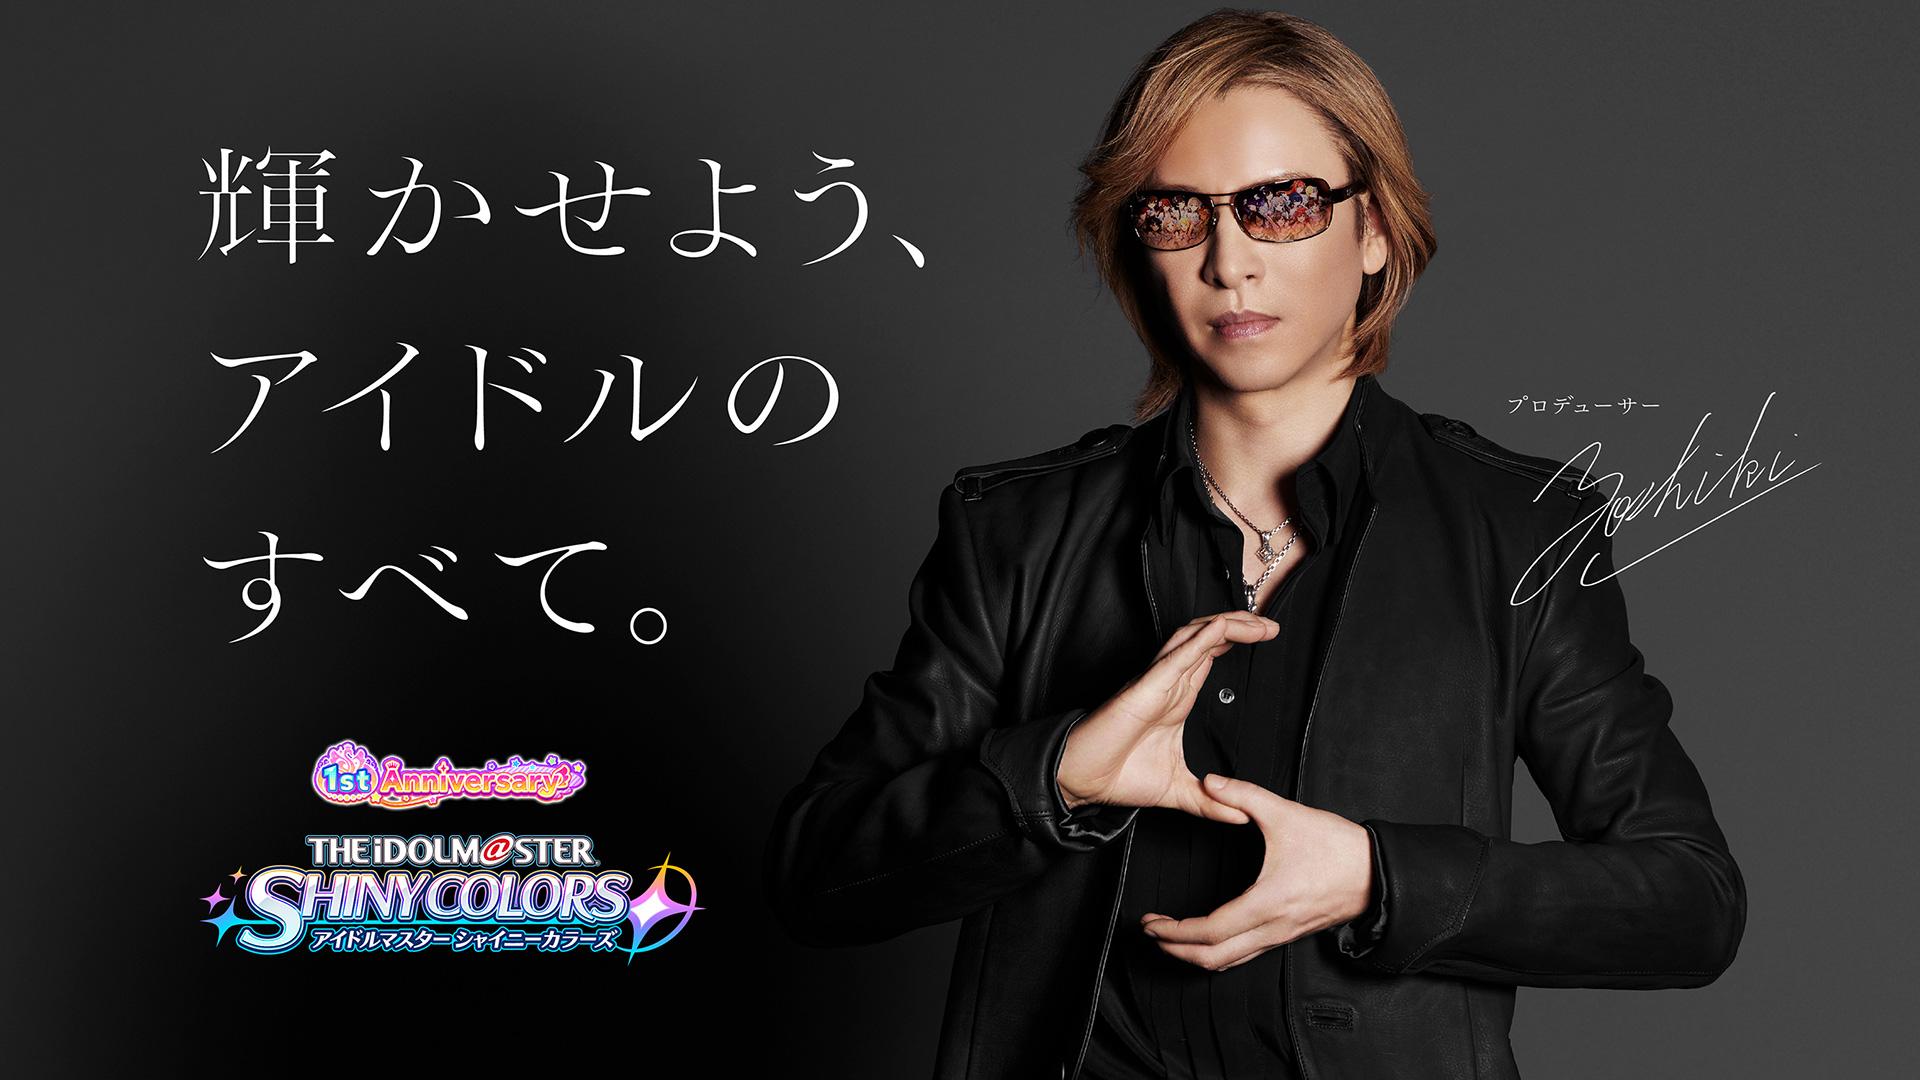 RMMS-Yoshiki-Idolmaster-Shiny-Colors-2019-CM-2